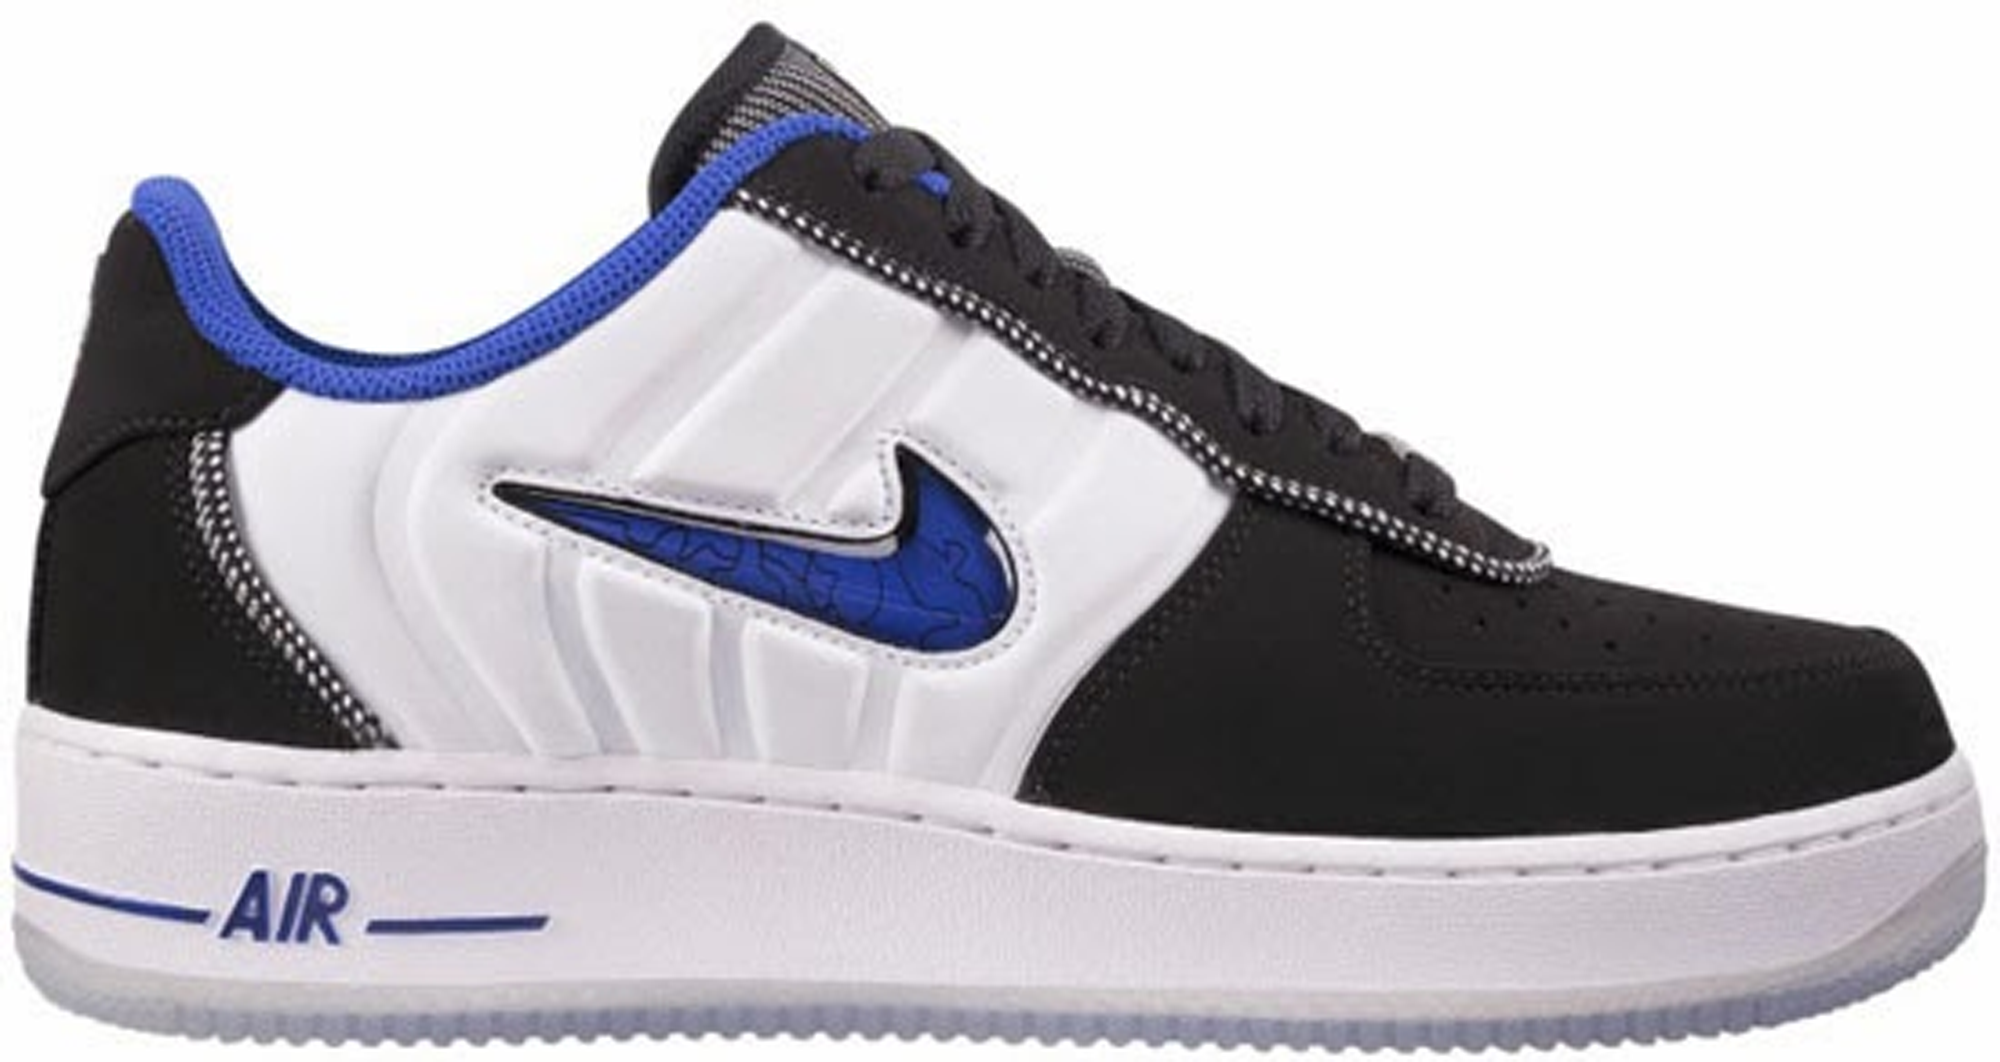 Nike Air Force 1 Low CMFT Penny